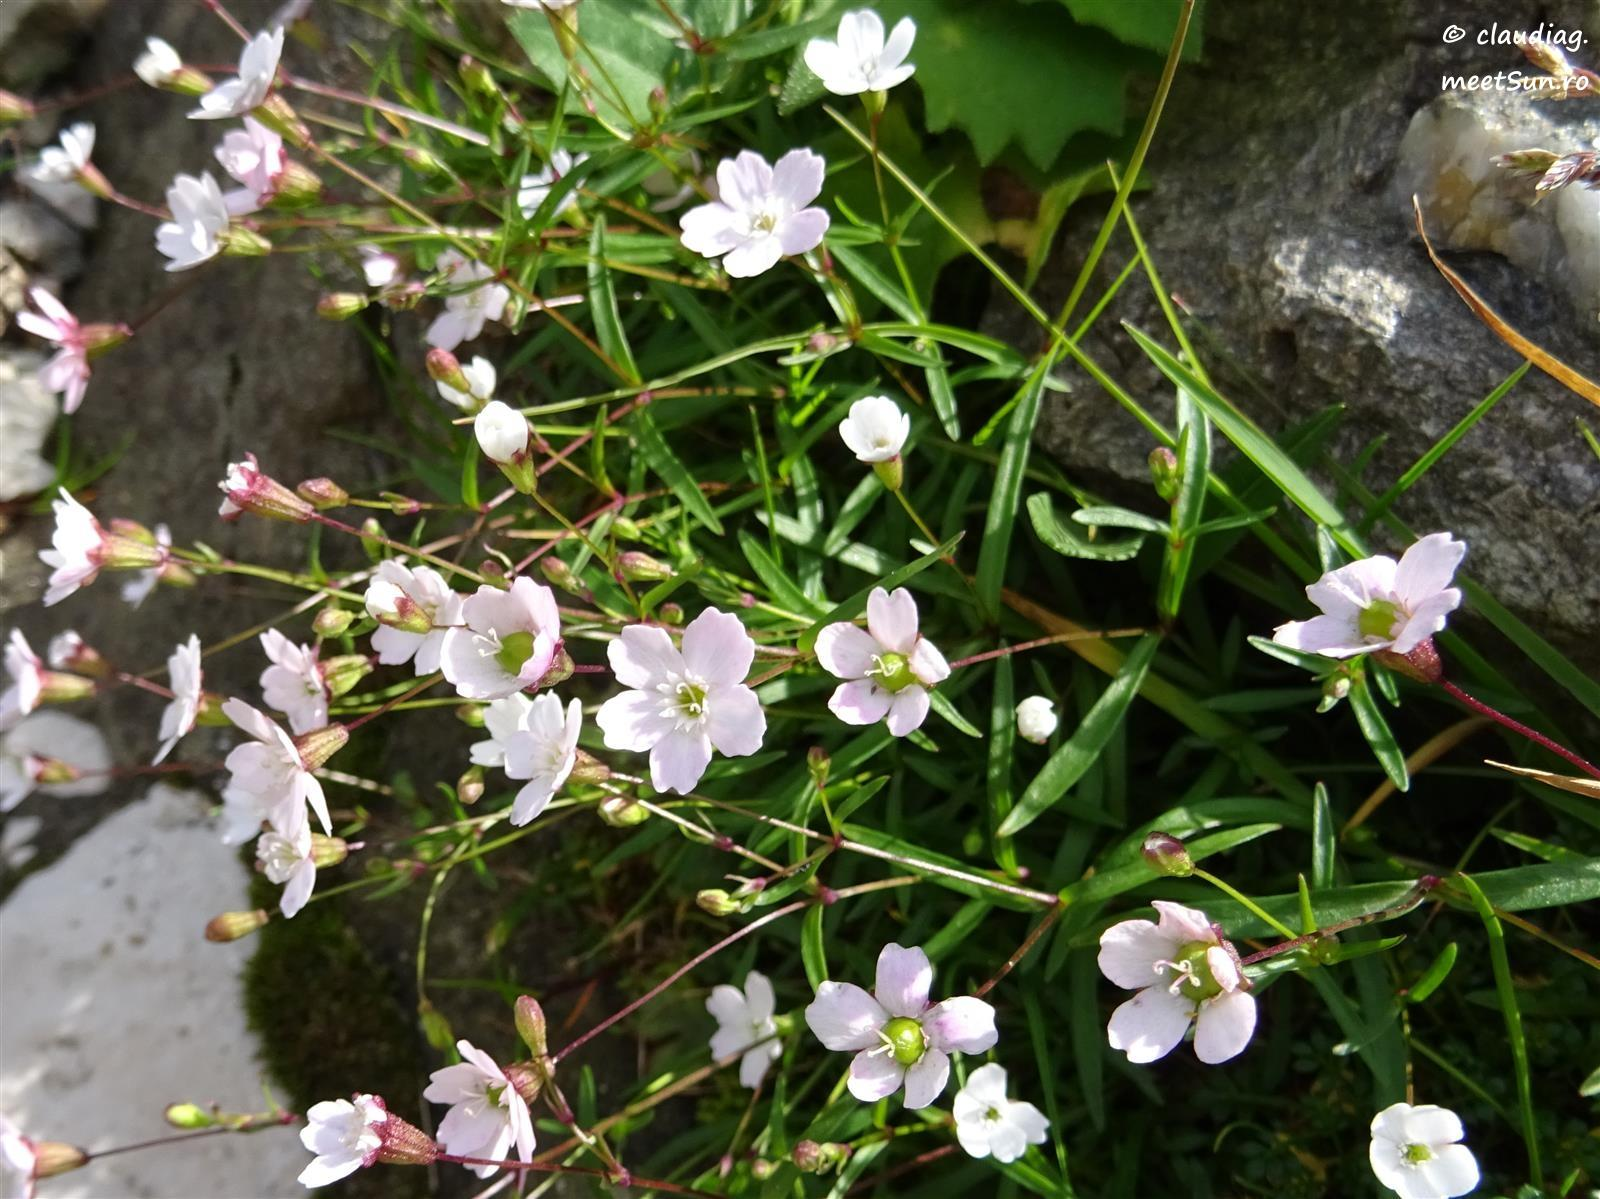 flori-albe-074.jpg